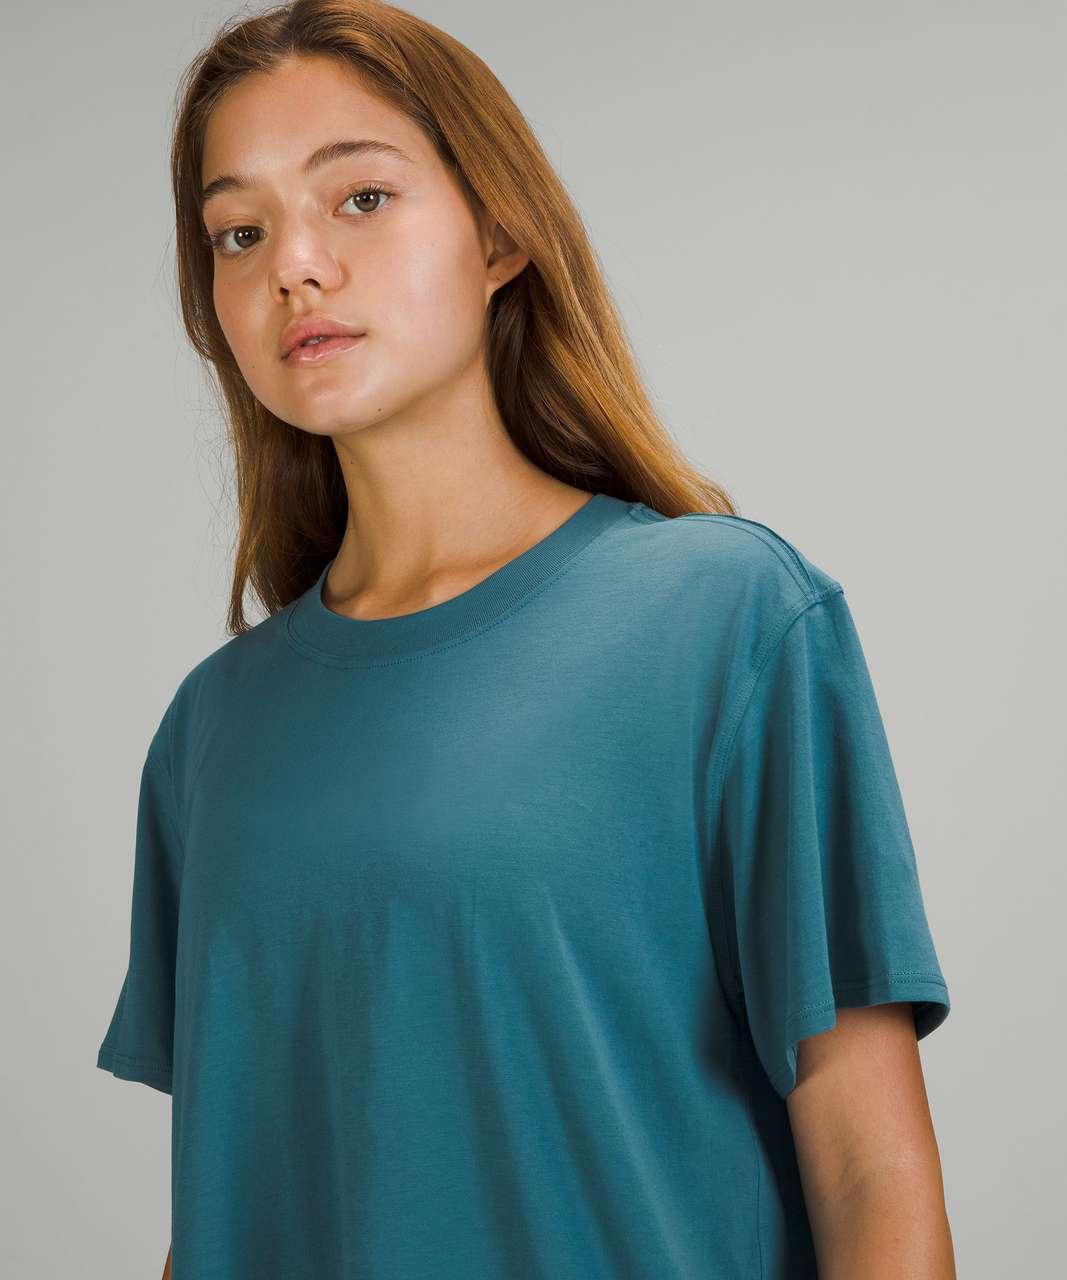 Lululemon All Yours Short Sleeve T-Shirt - Capture Blue